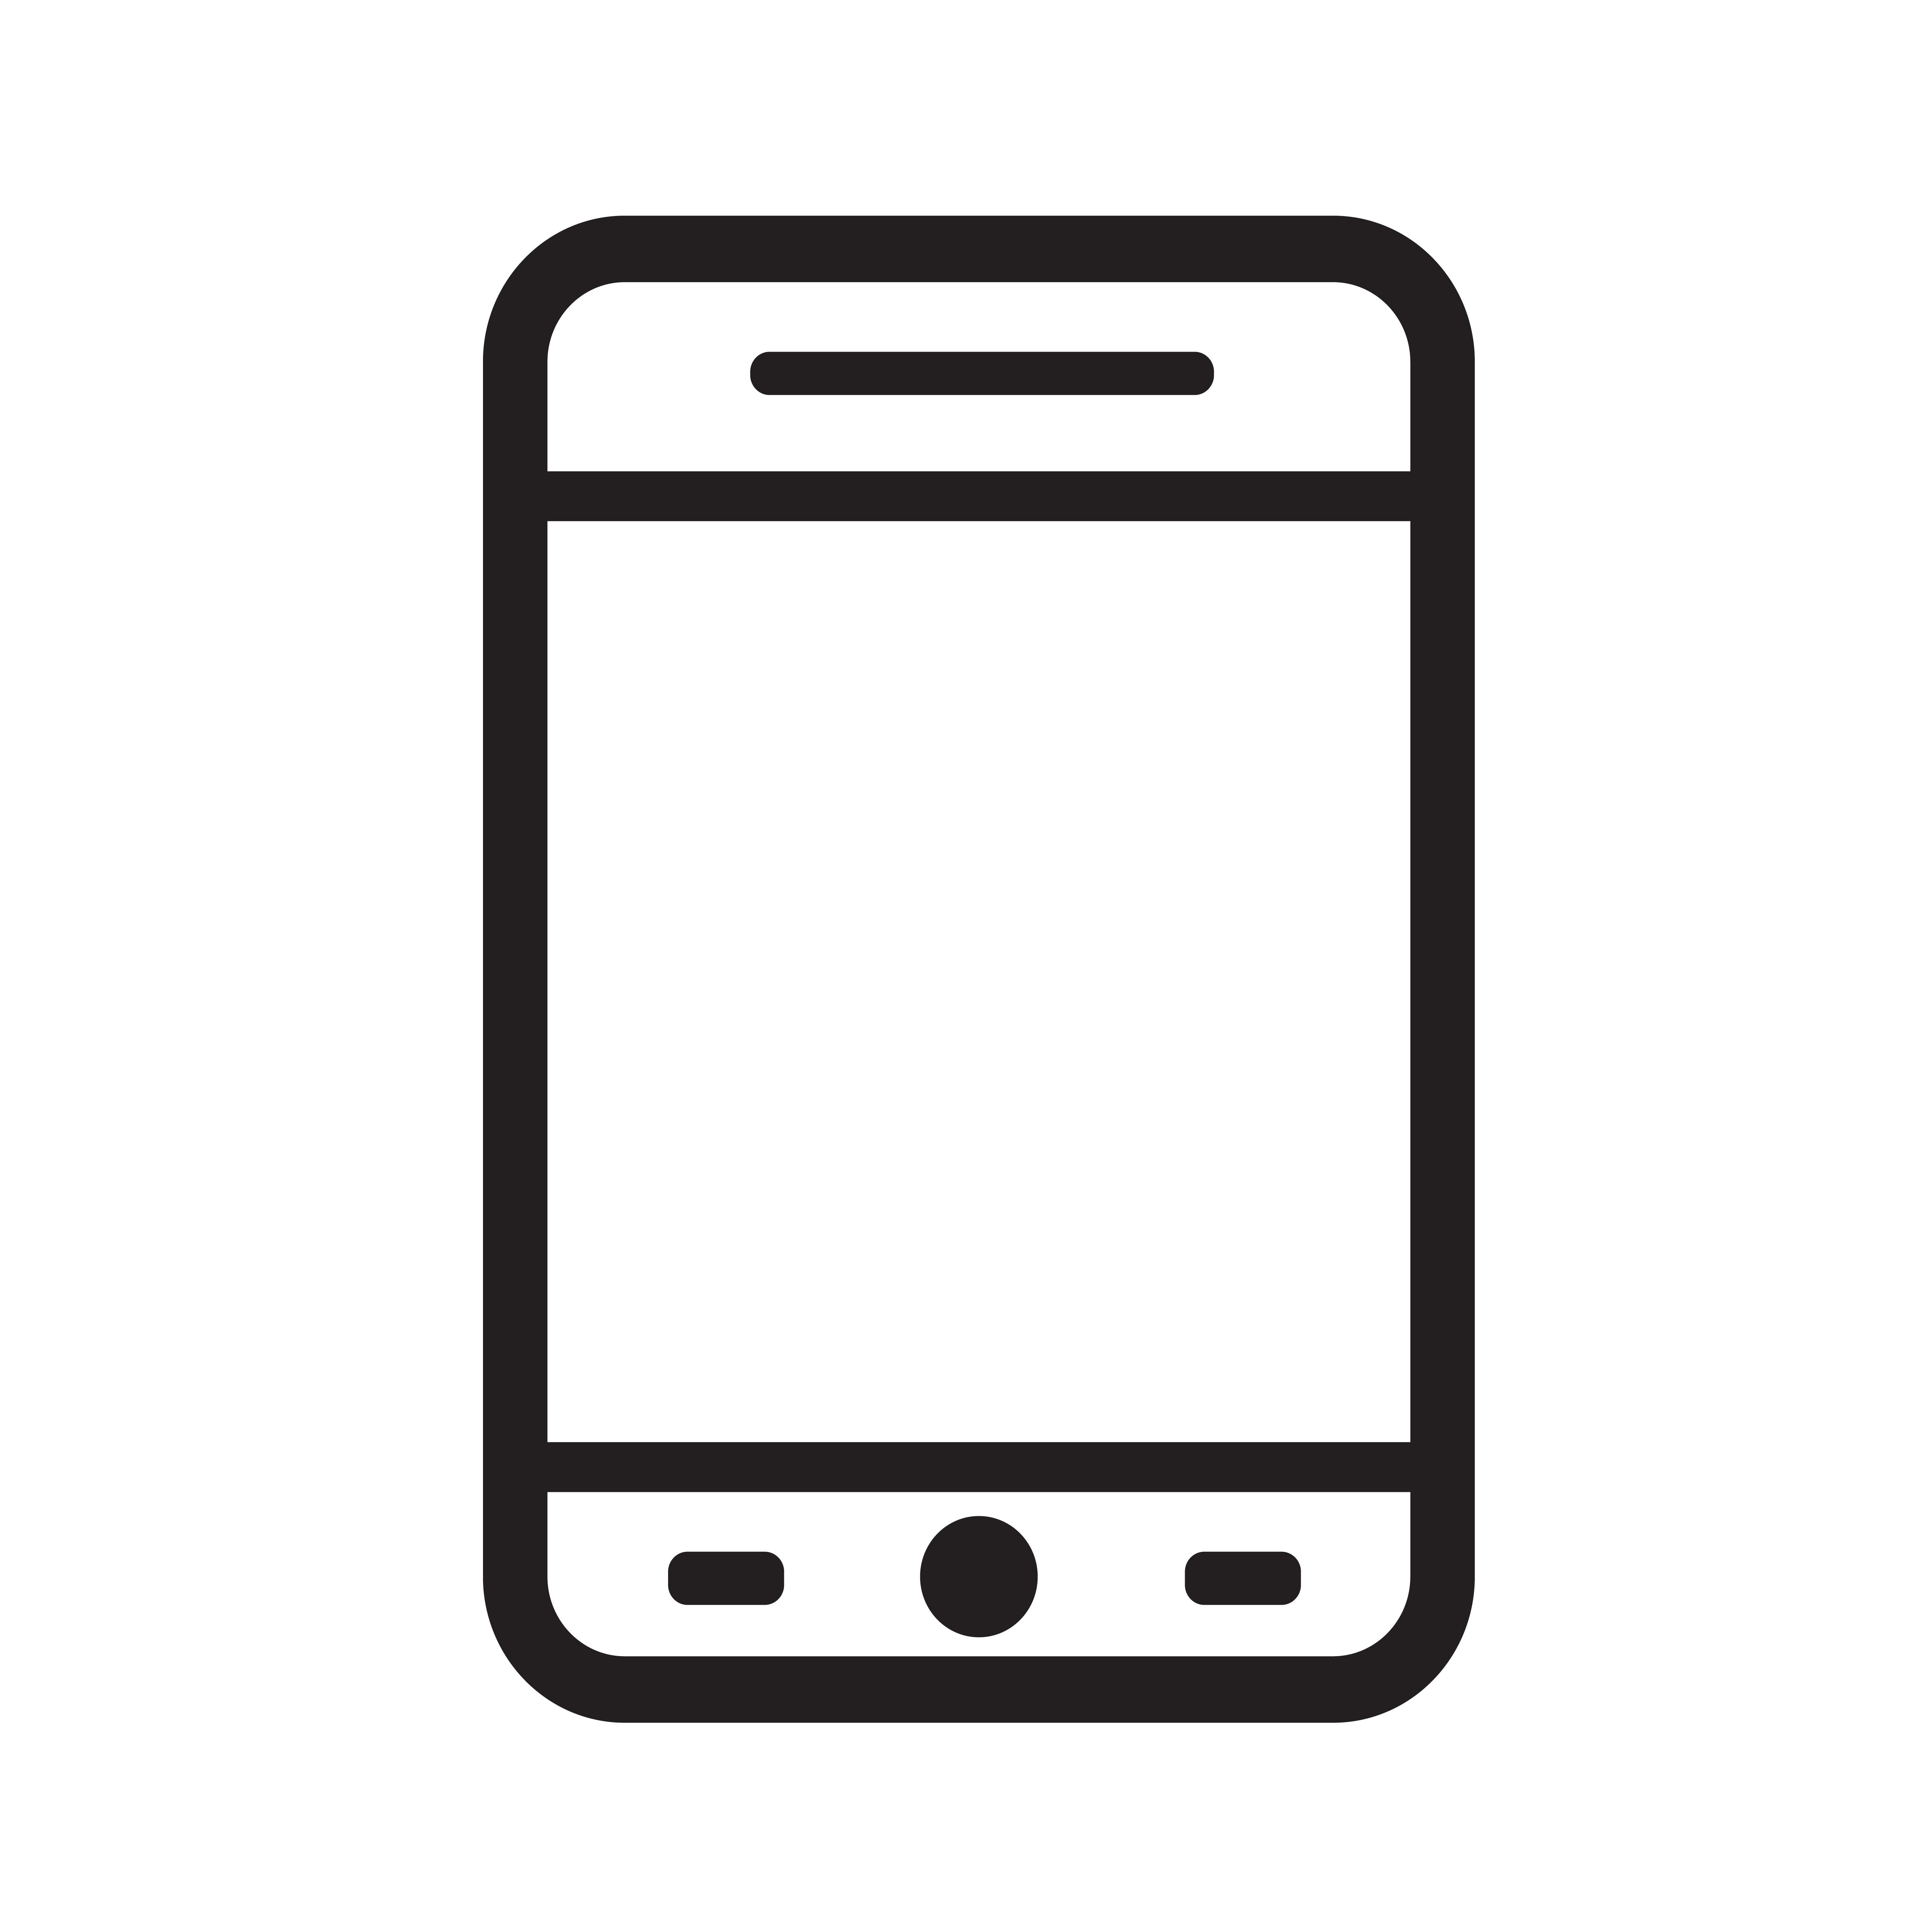 smartphone icon vector illustration - Download Free ...